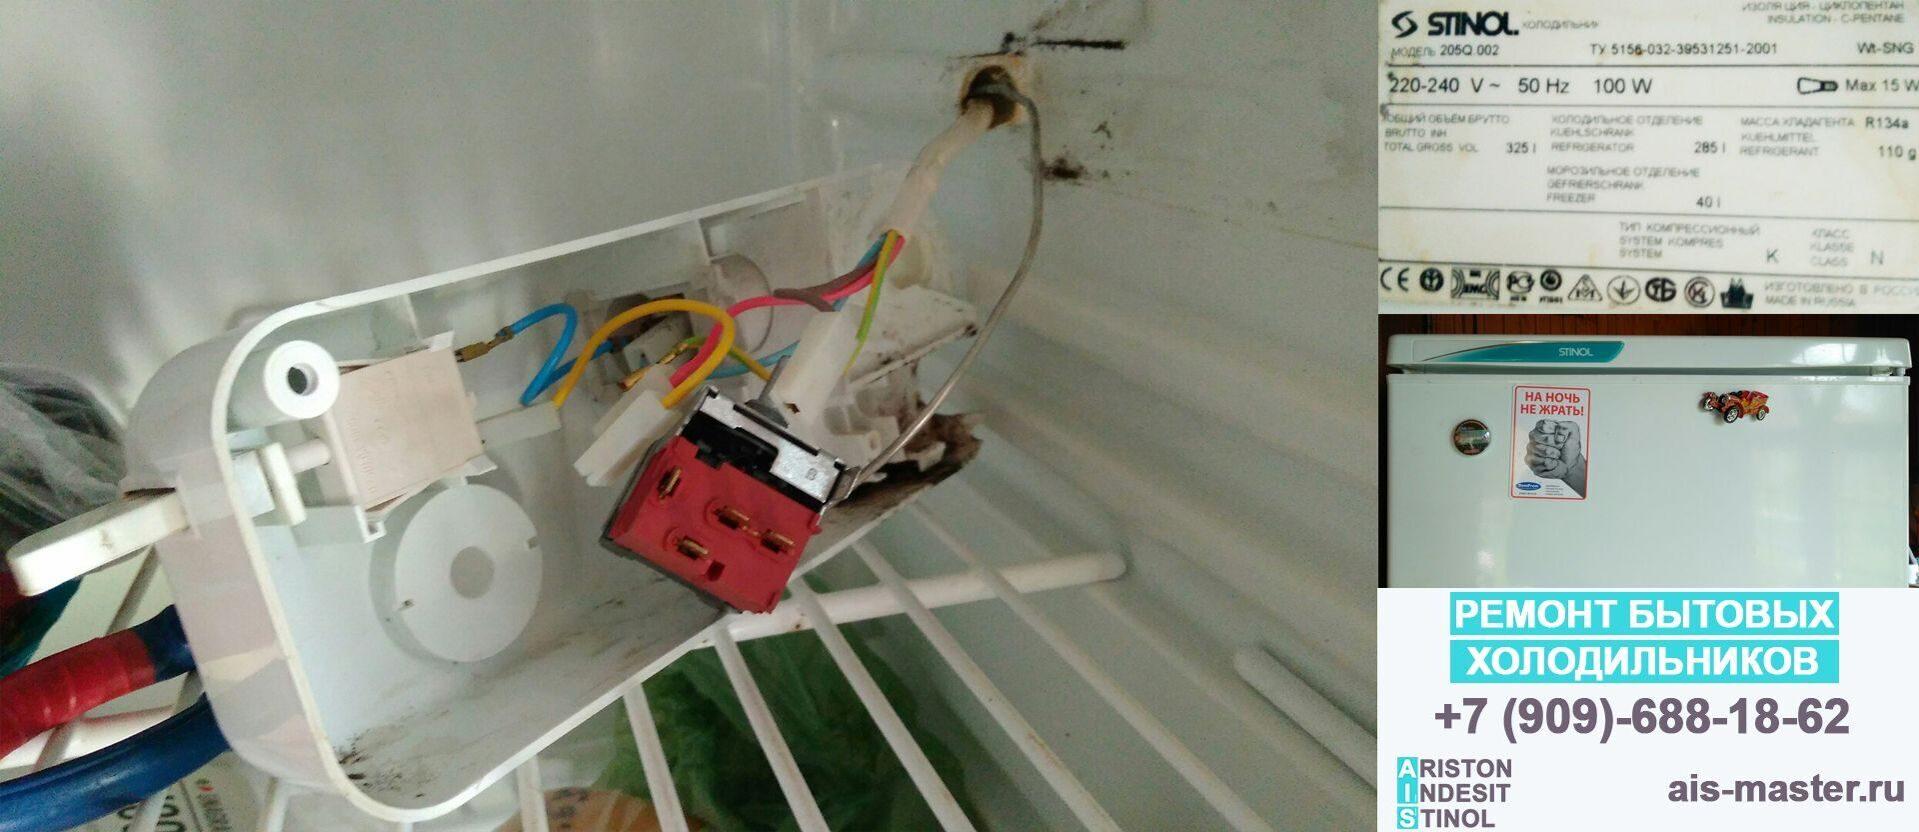 Своими руками ремонт холодильника стинол 101 24